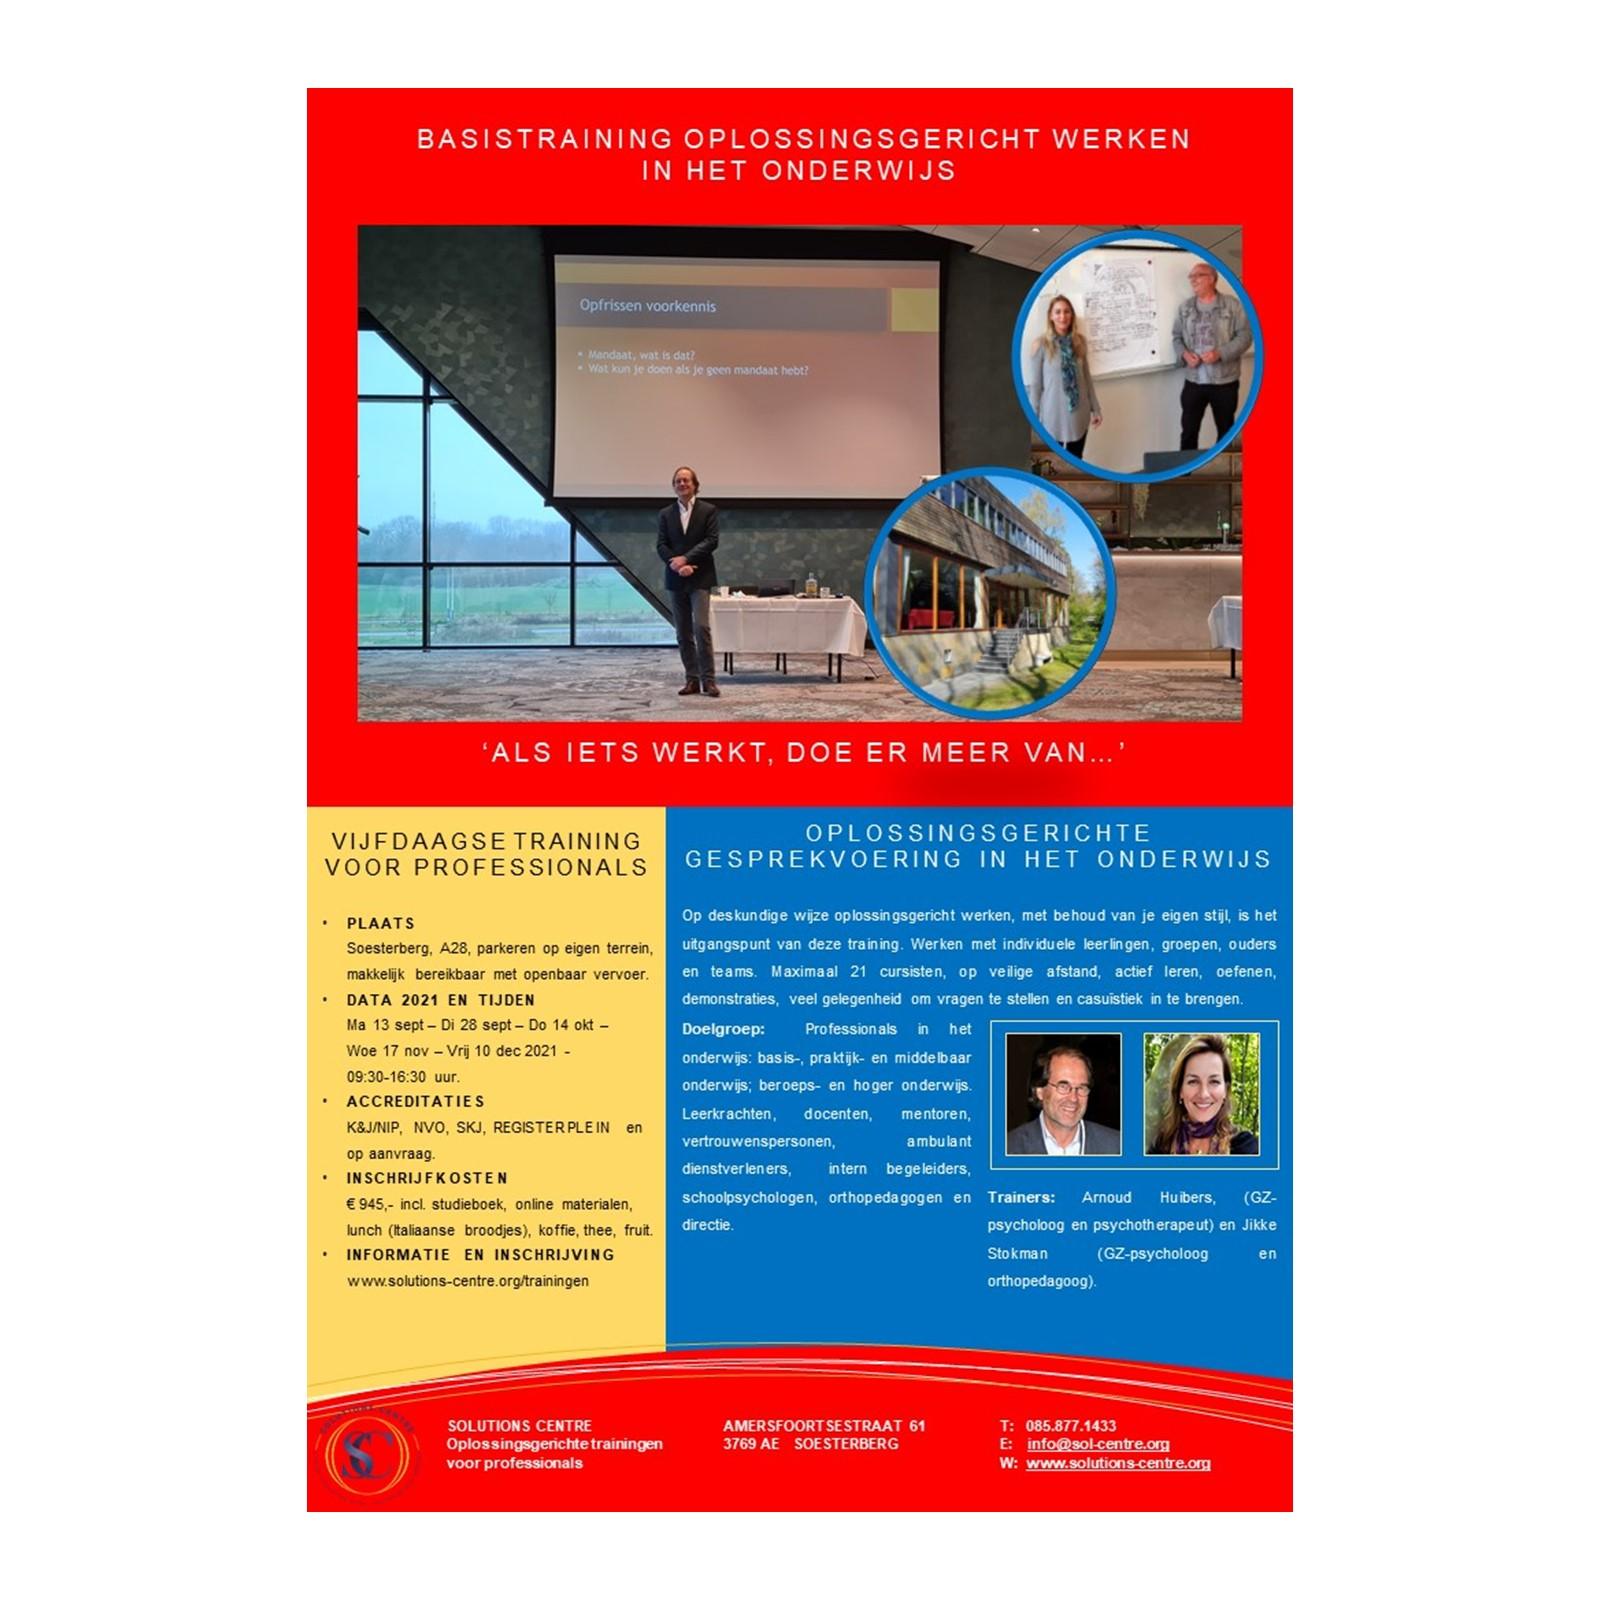 Basistraining Oplossingsgericht Werken in het Onderwijs, Solutions Centre, Soesterberg, Arnoud Huibers, Jikke Stokman